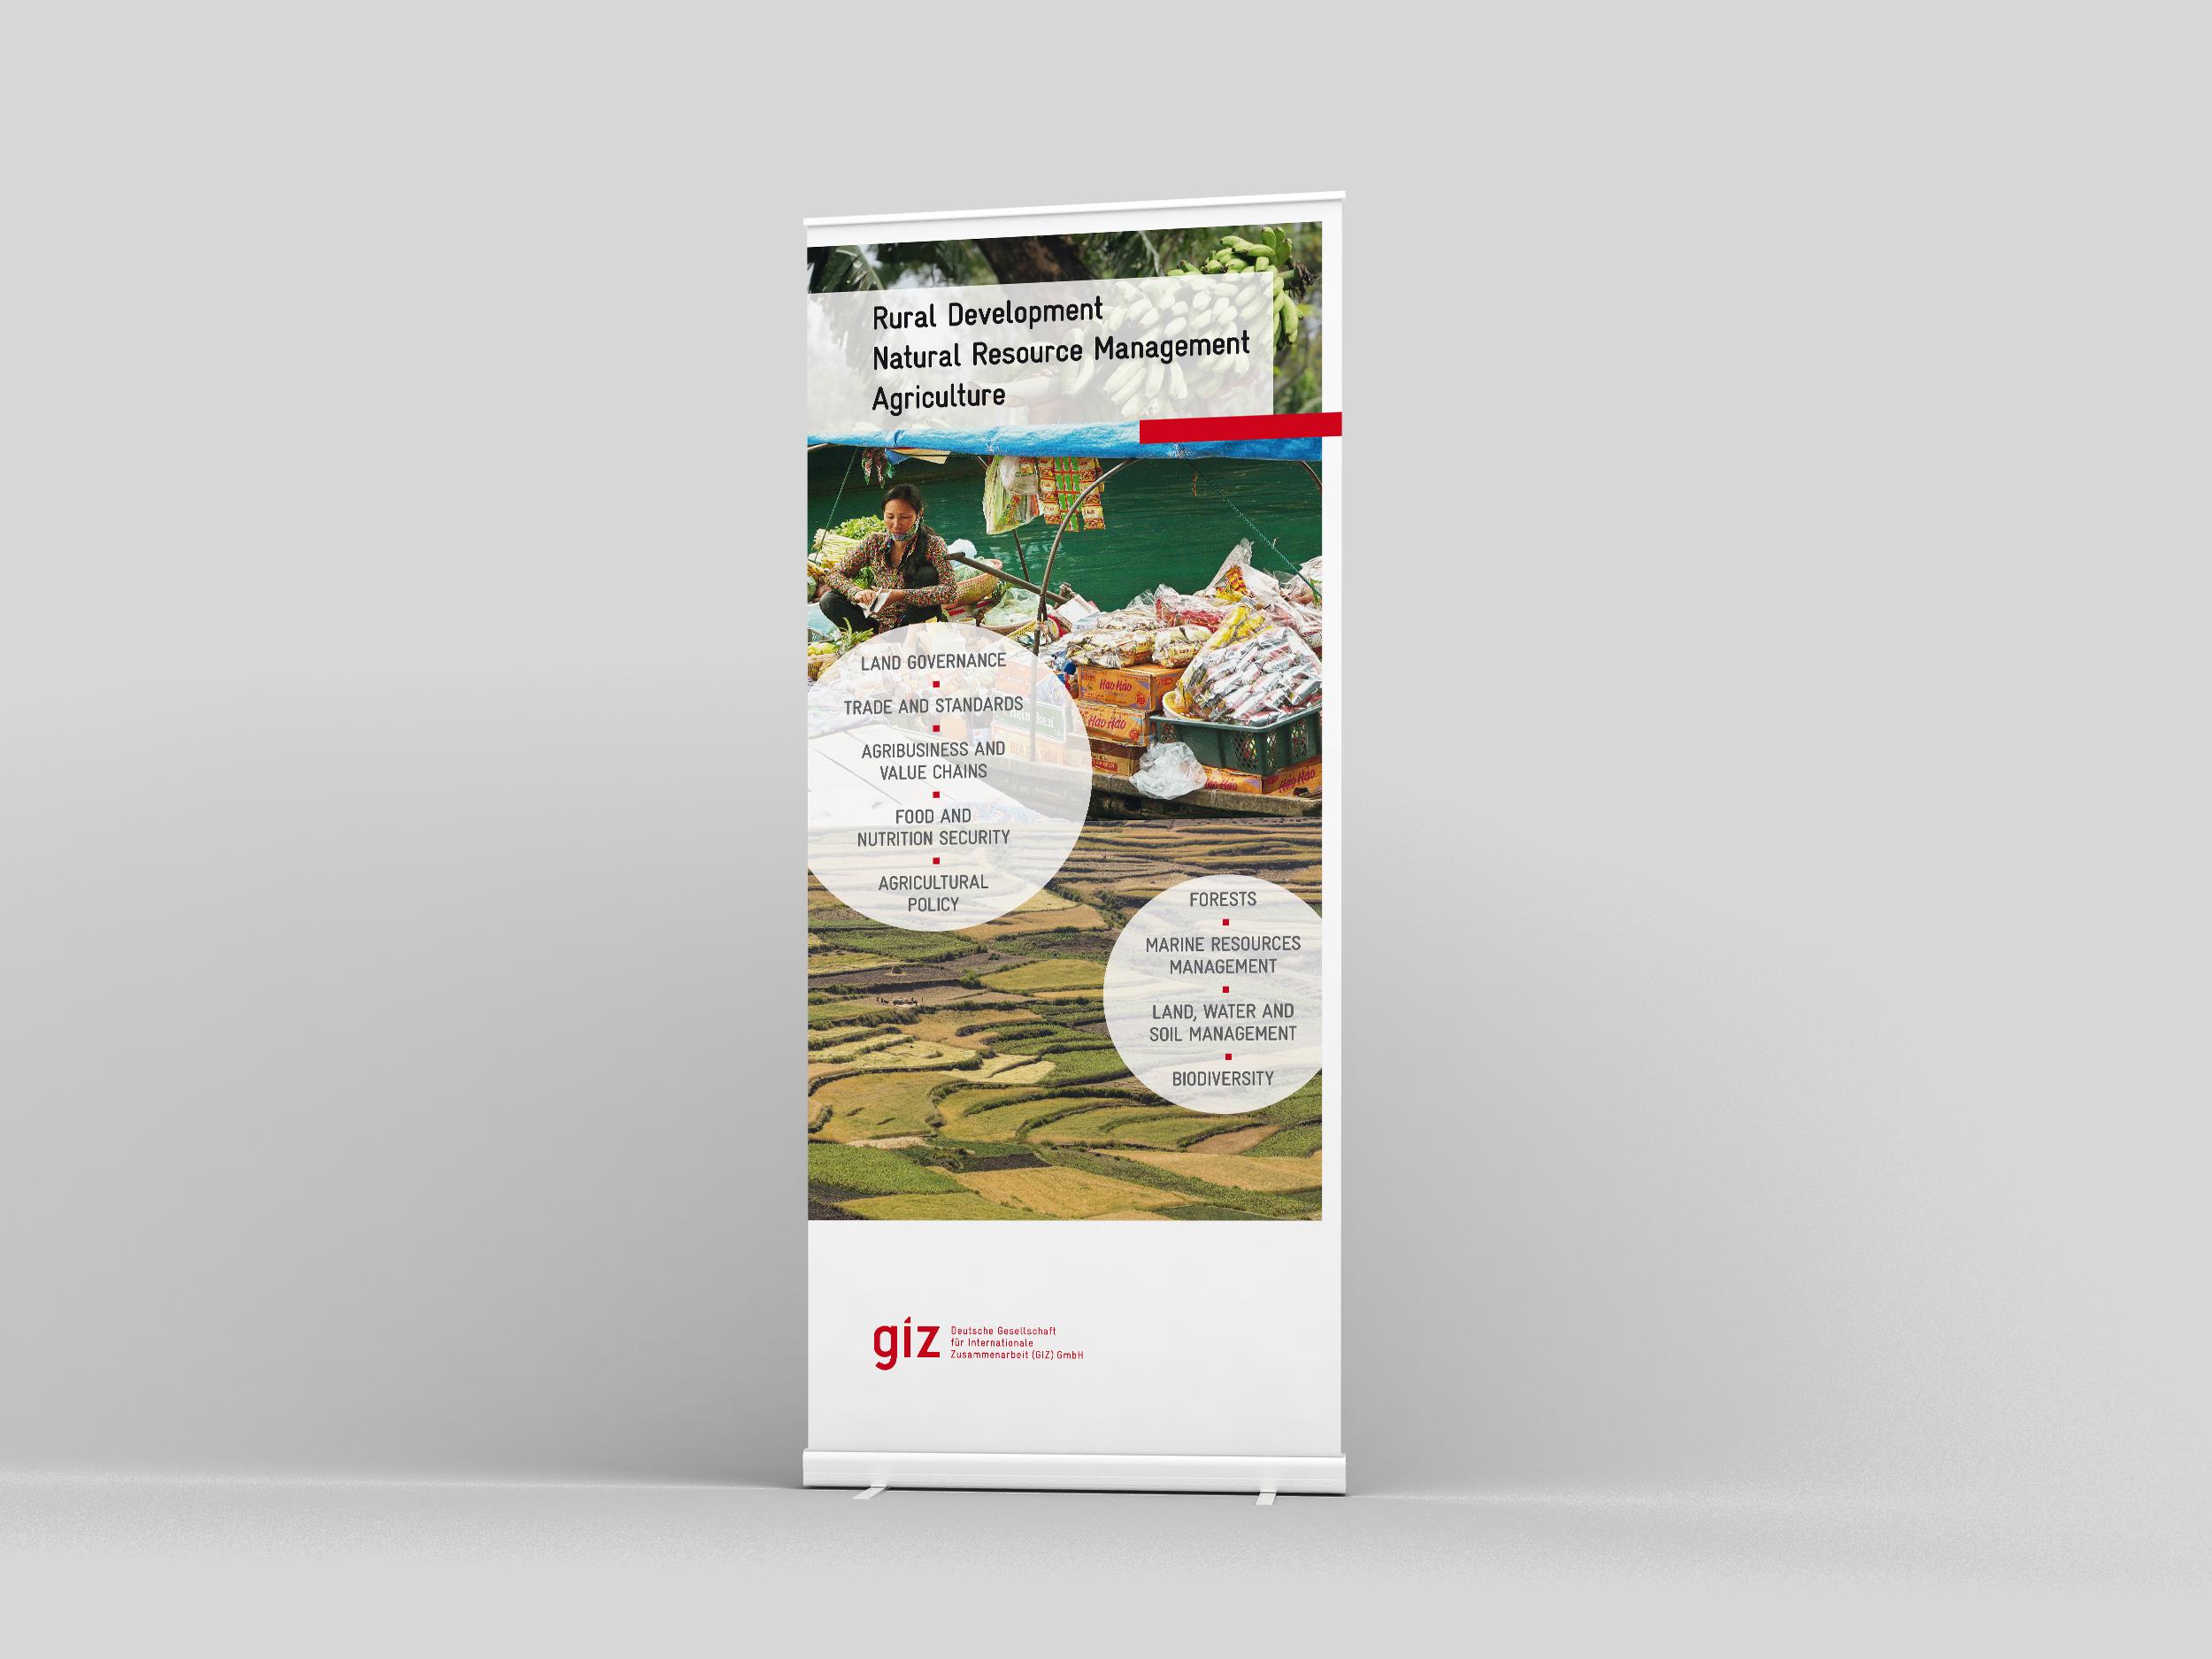 GIZ Roll-Up Banner